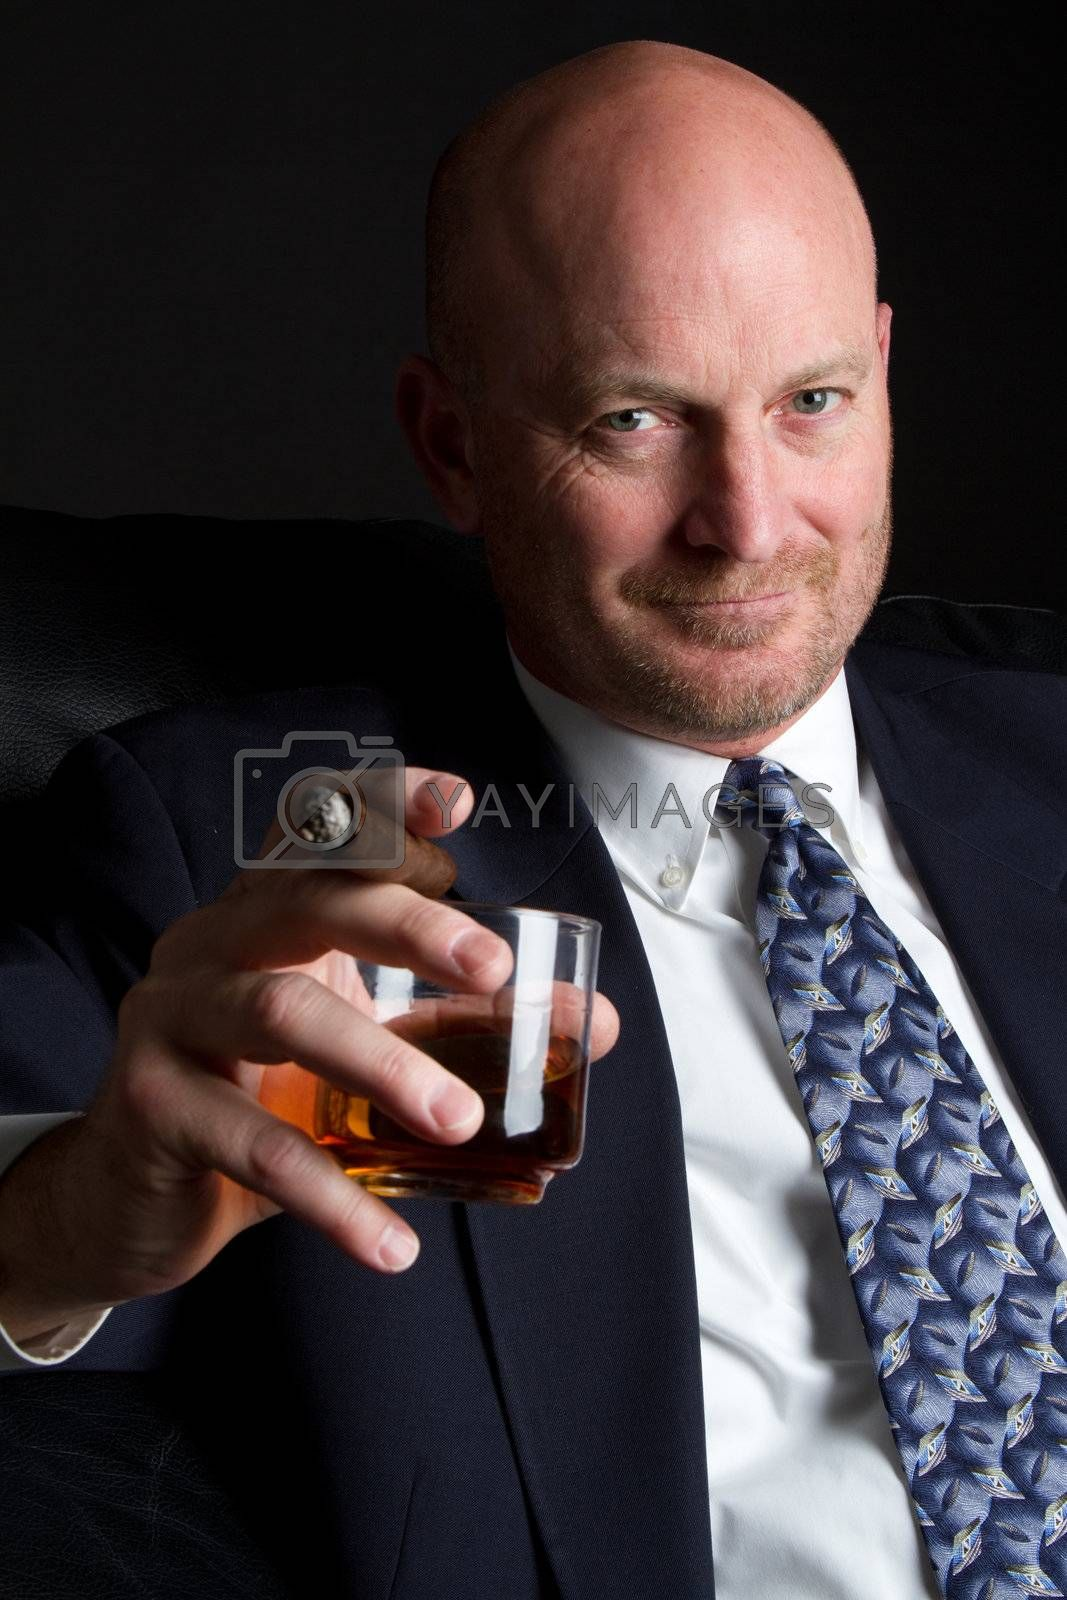 Man drinking alcohol smoking cigar